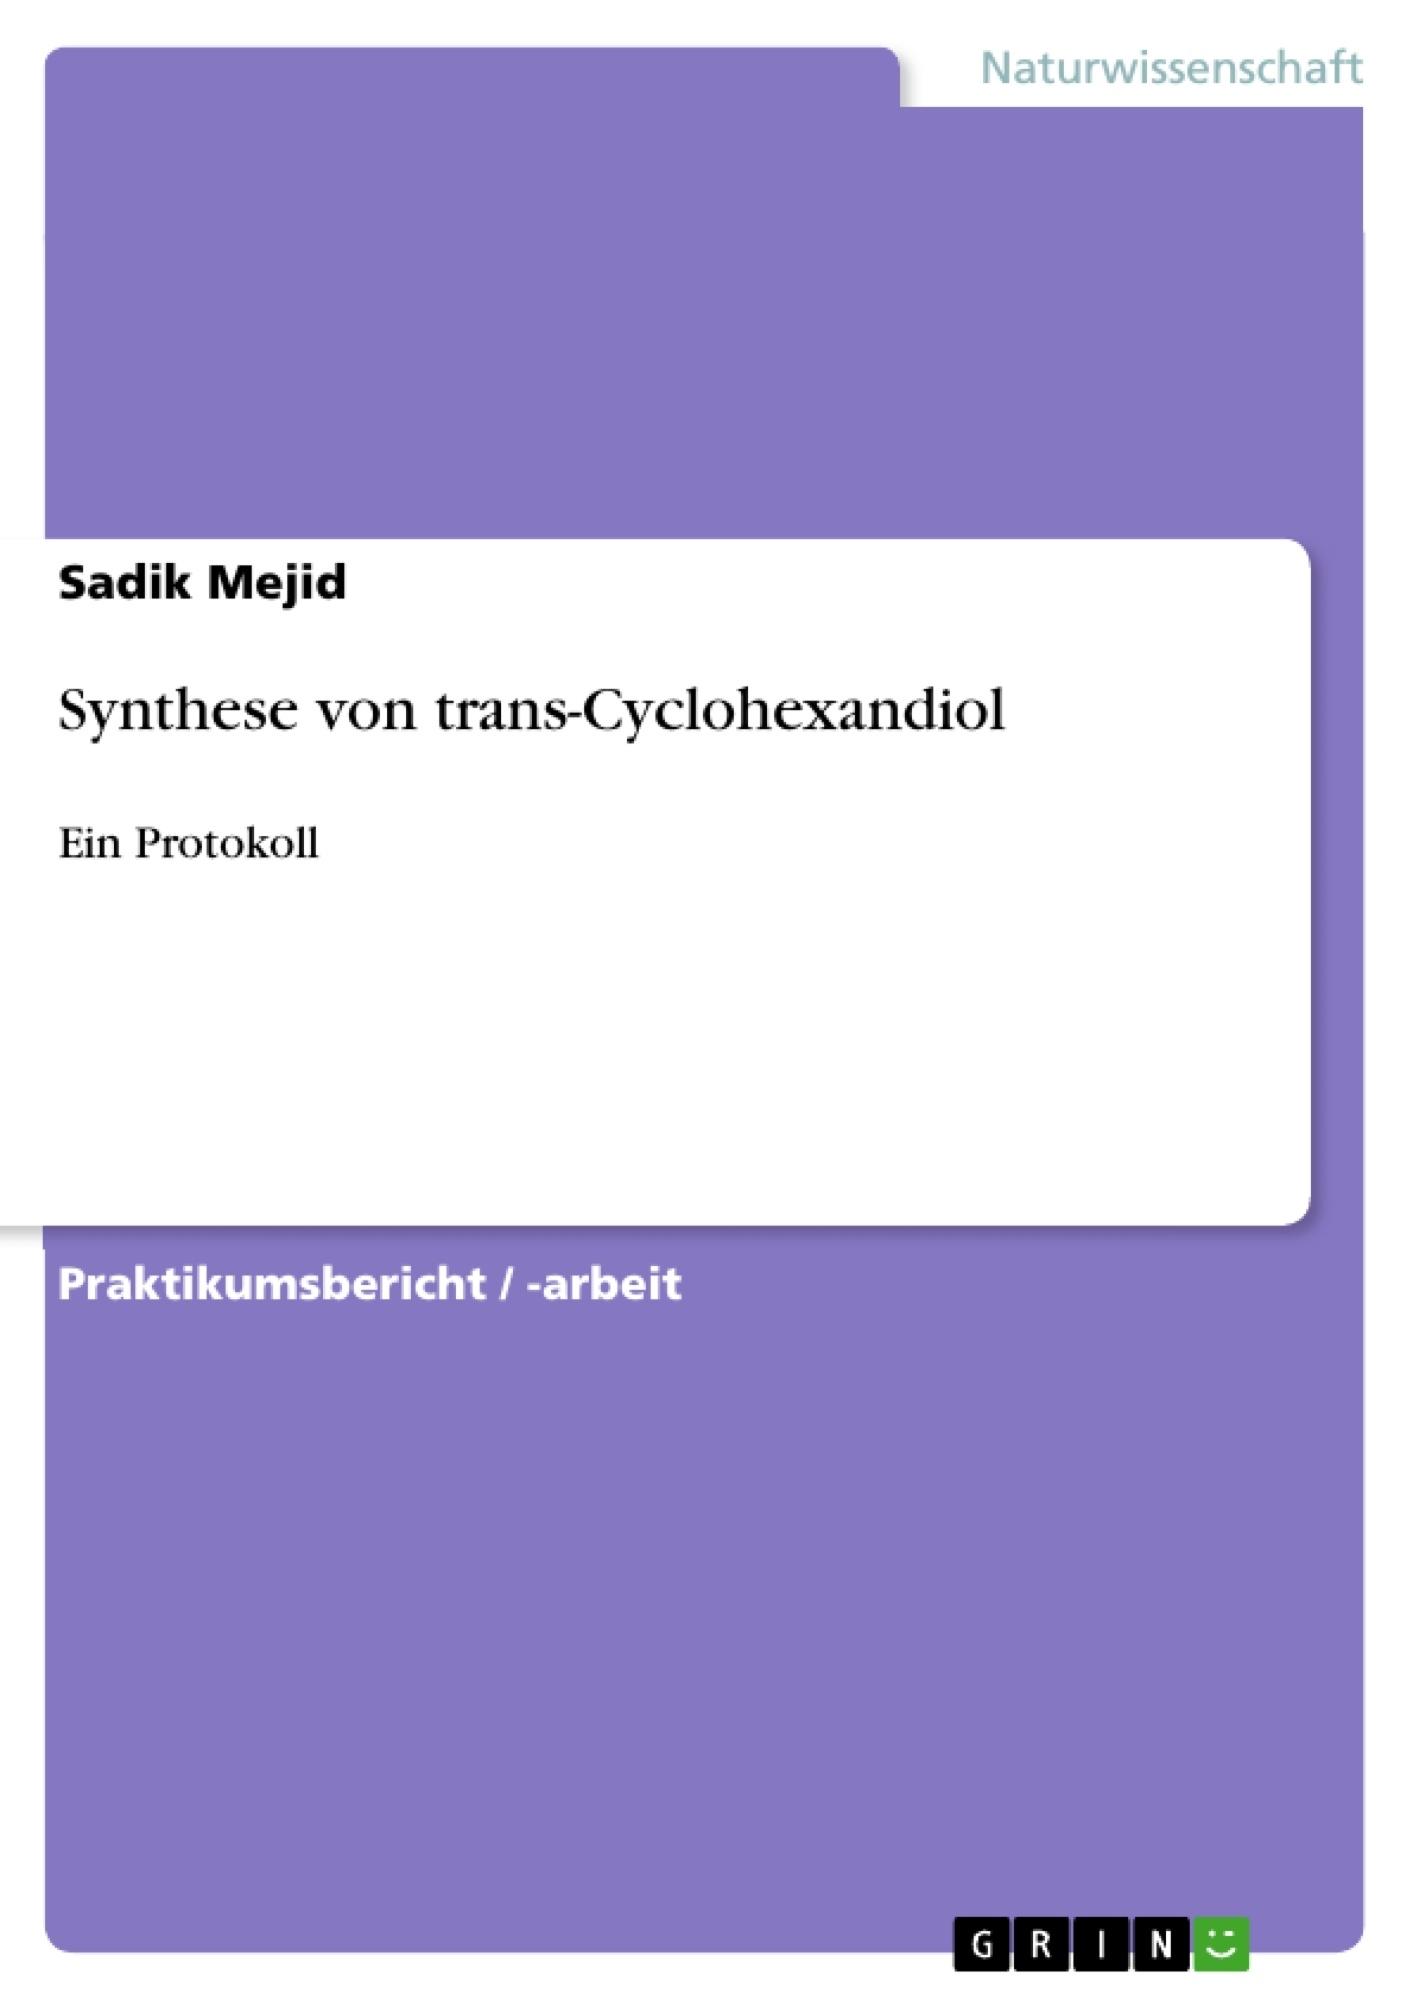 Titel: Synthese von trans-Cyclohexandiol